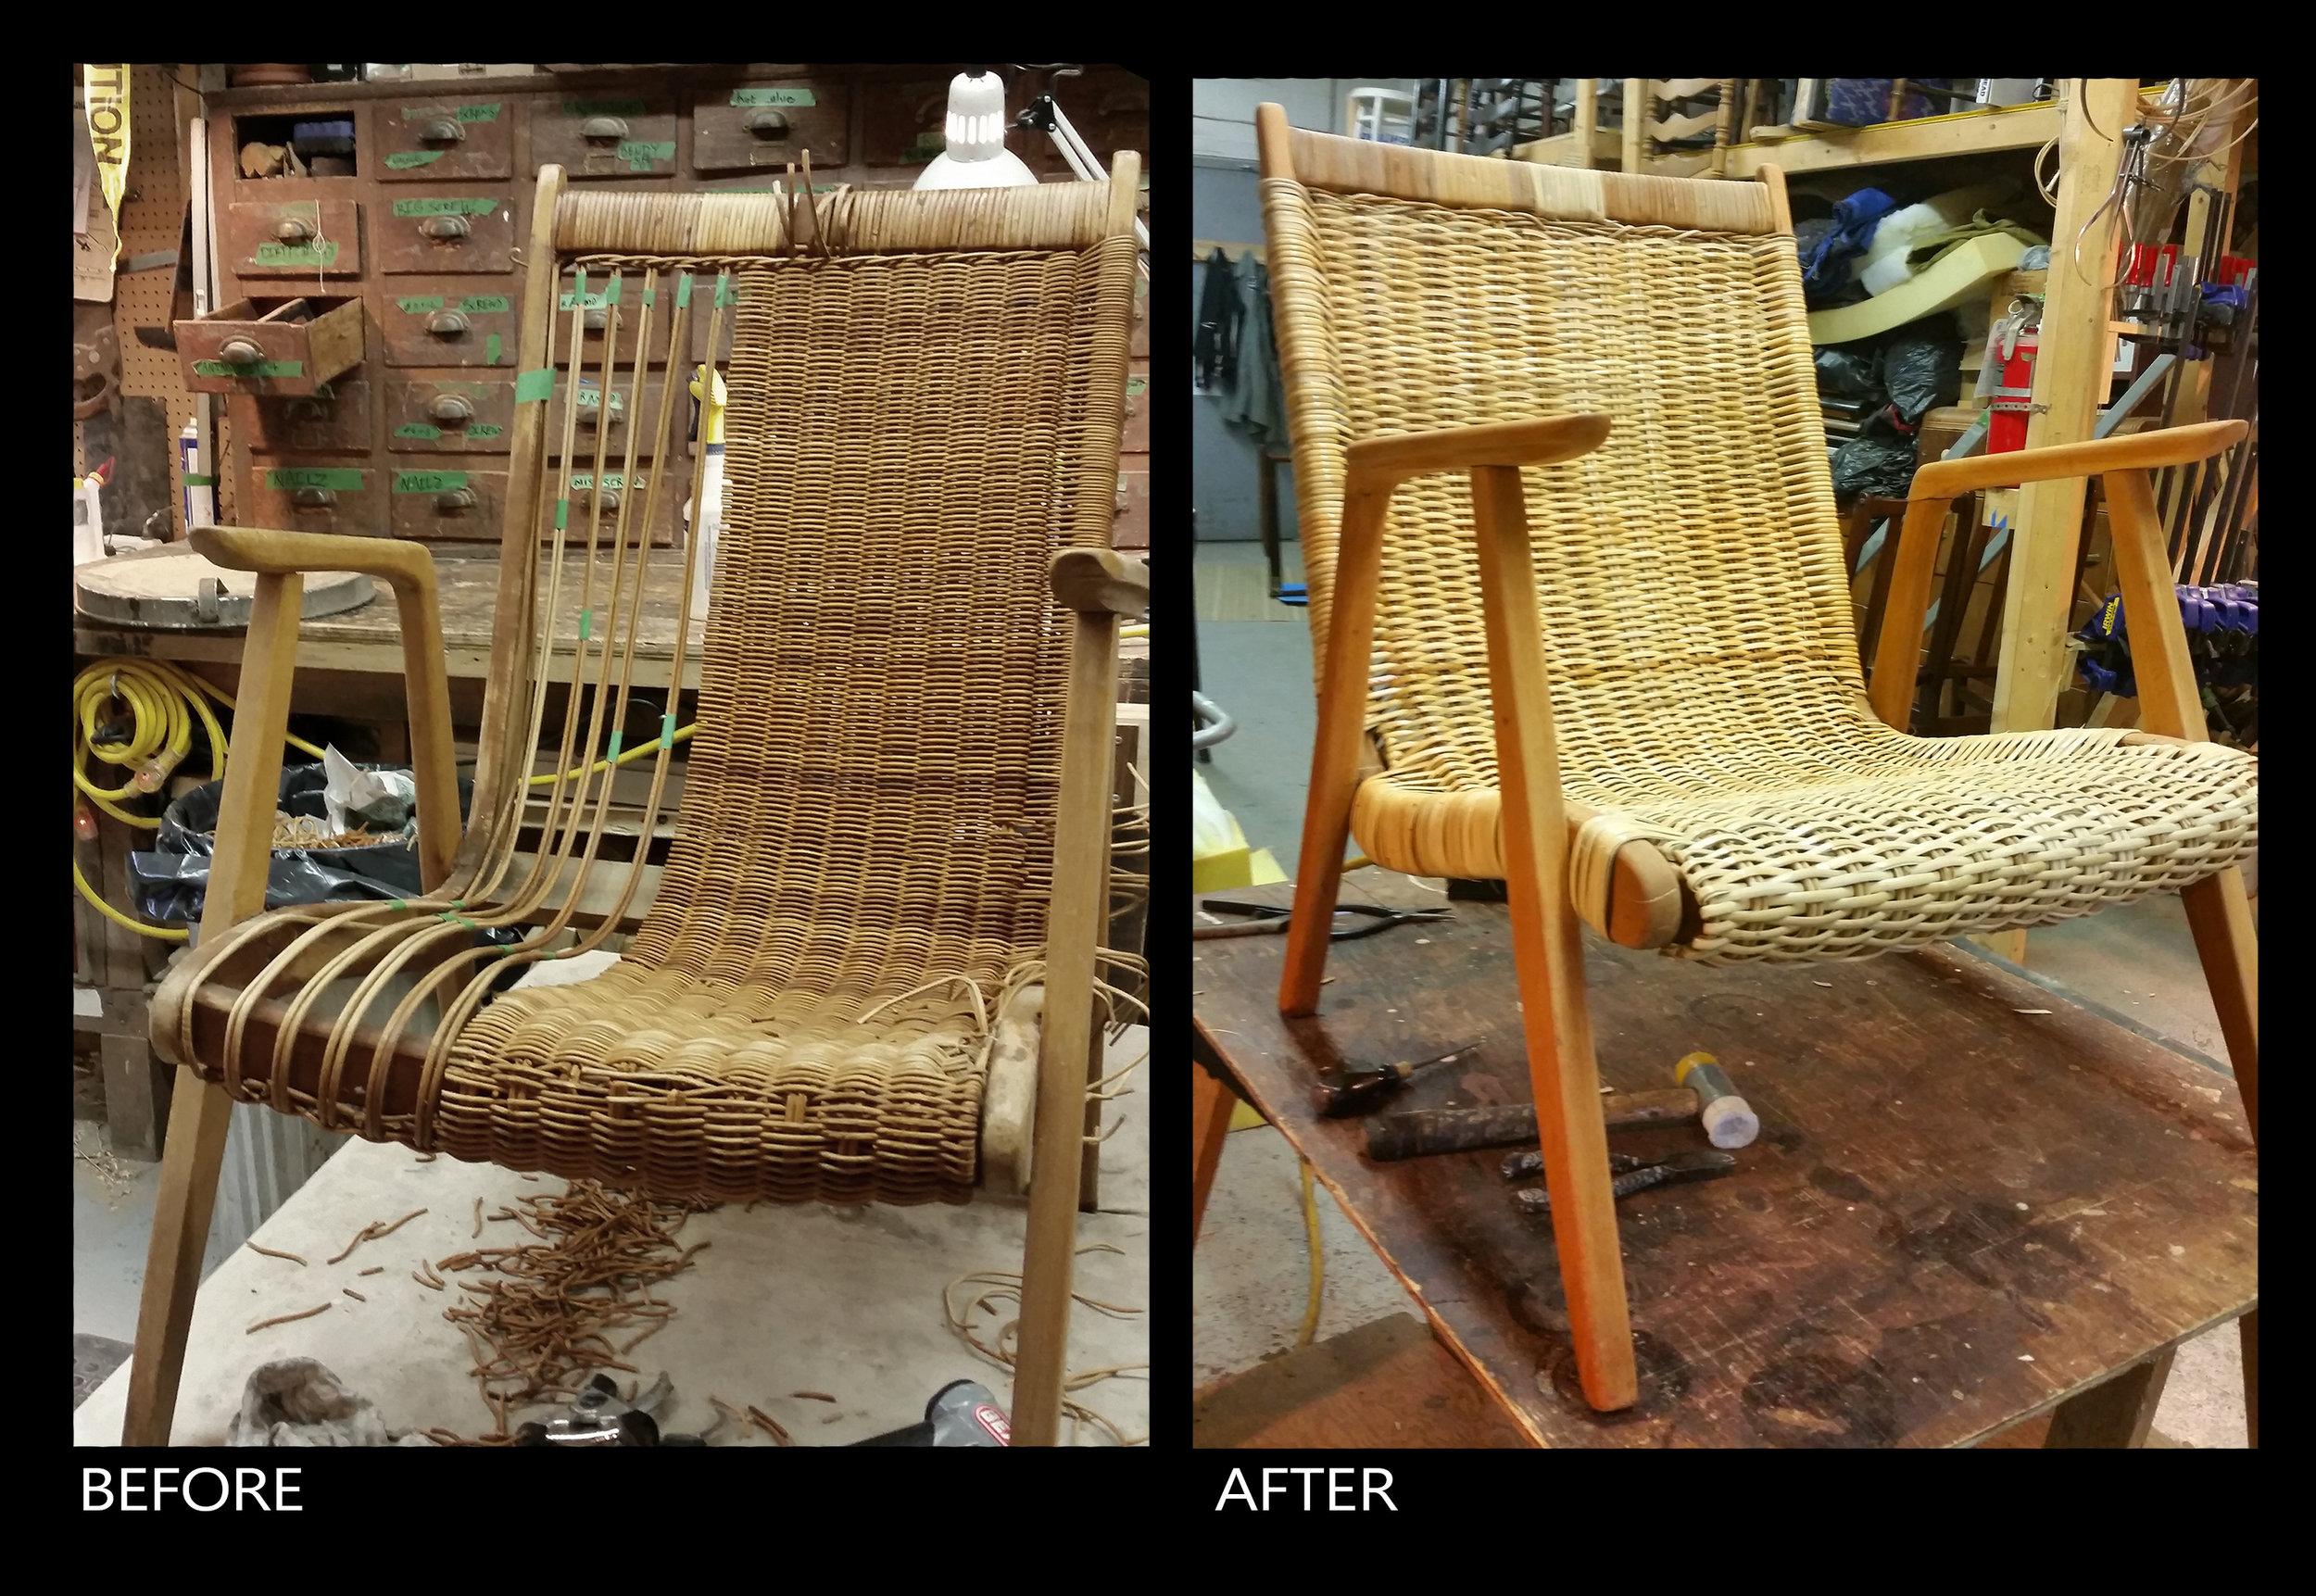 mid-century modern lounging binding cane chair.